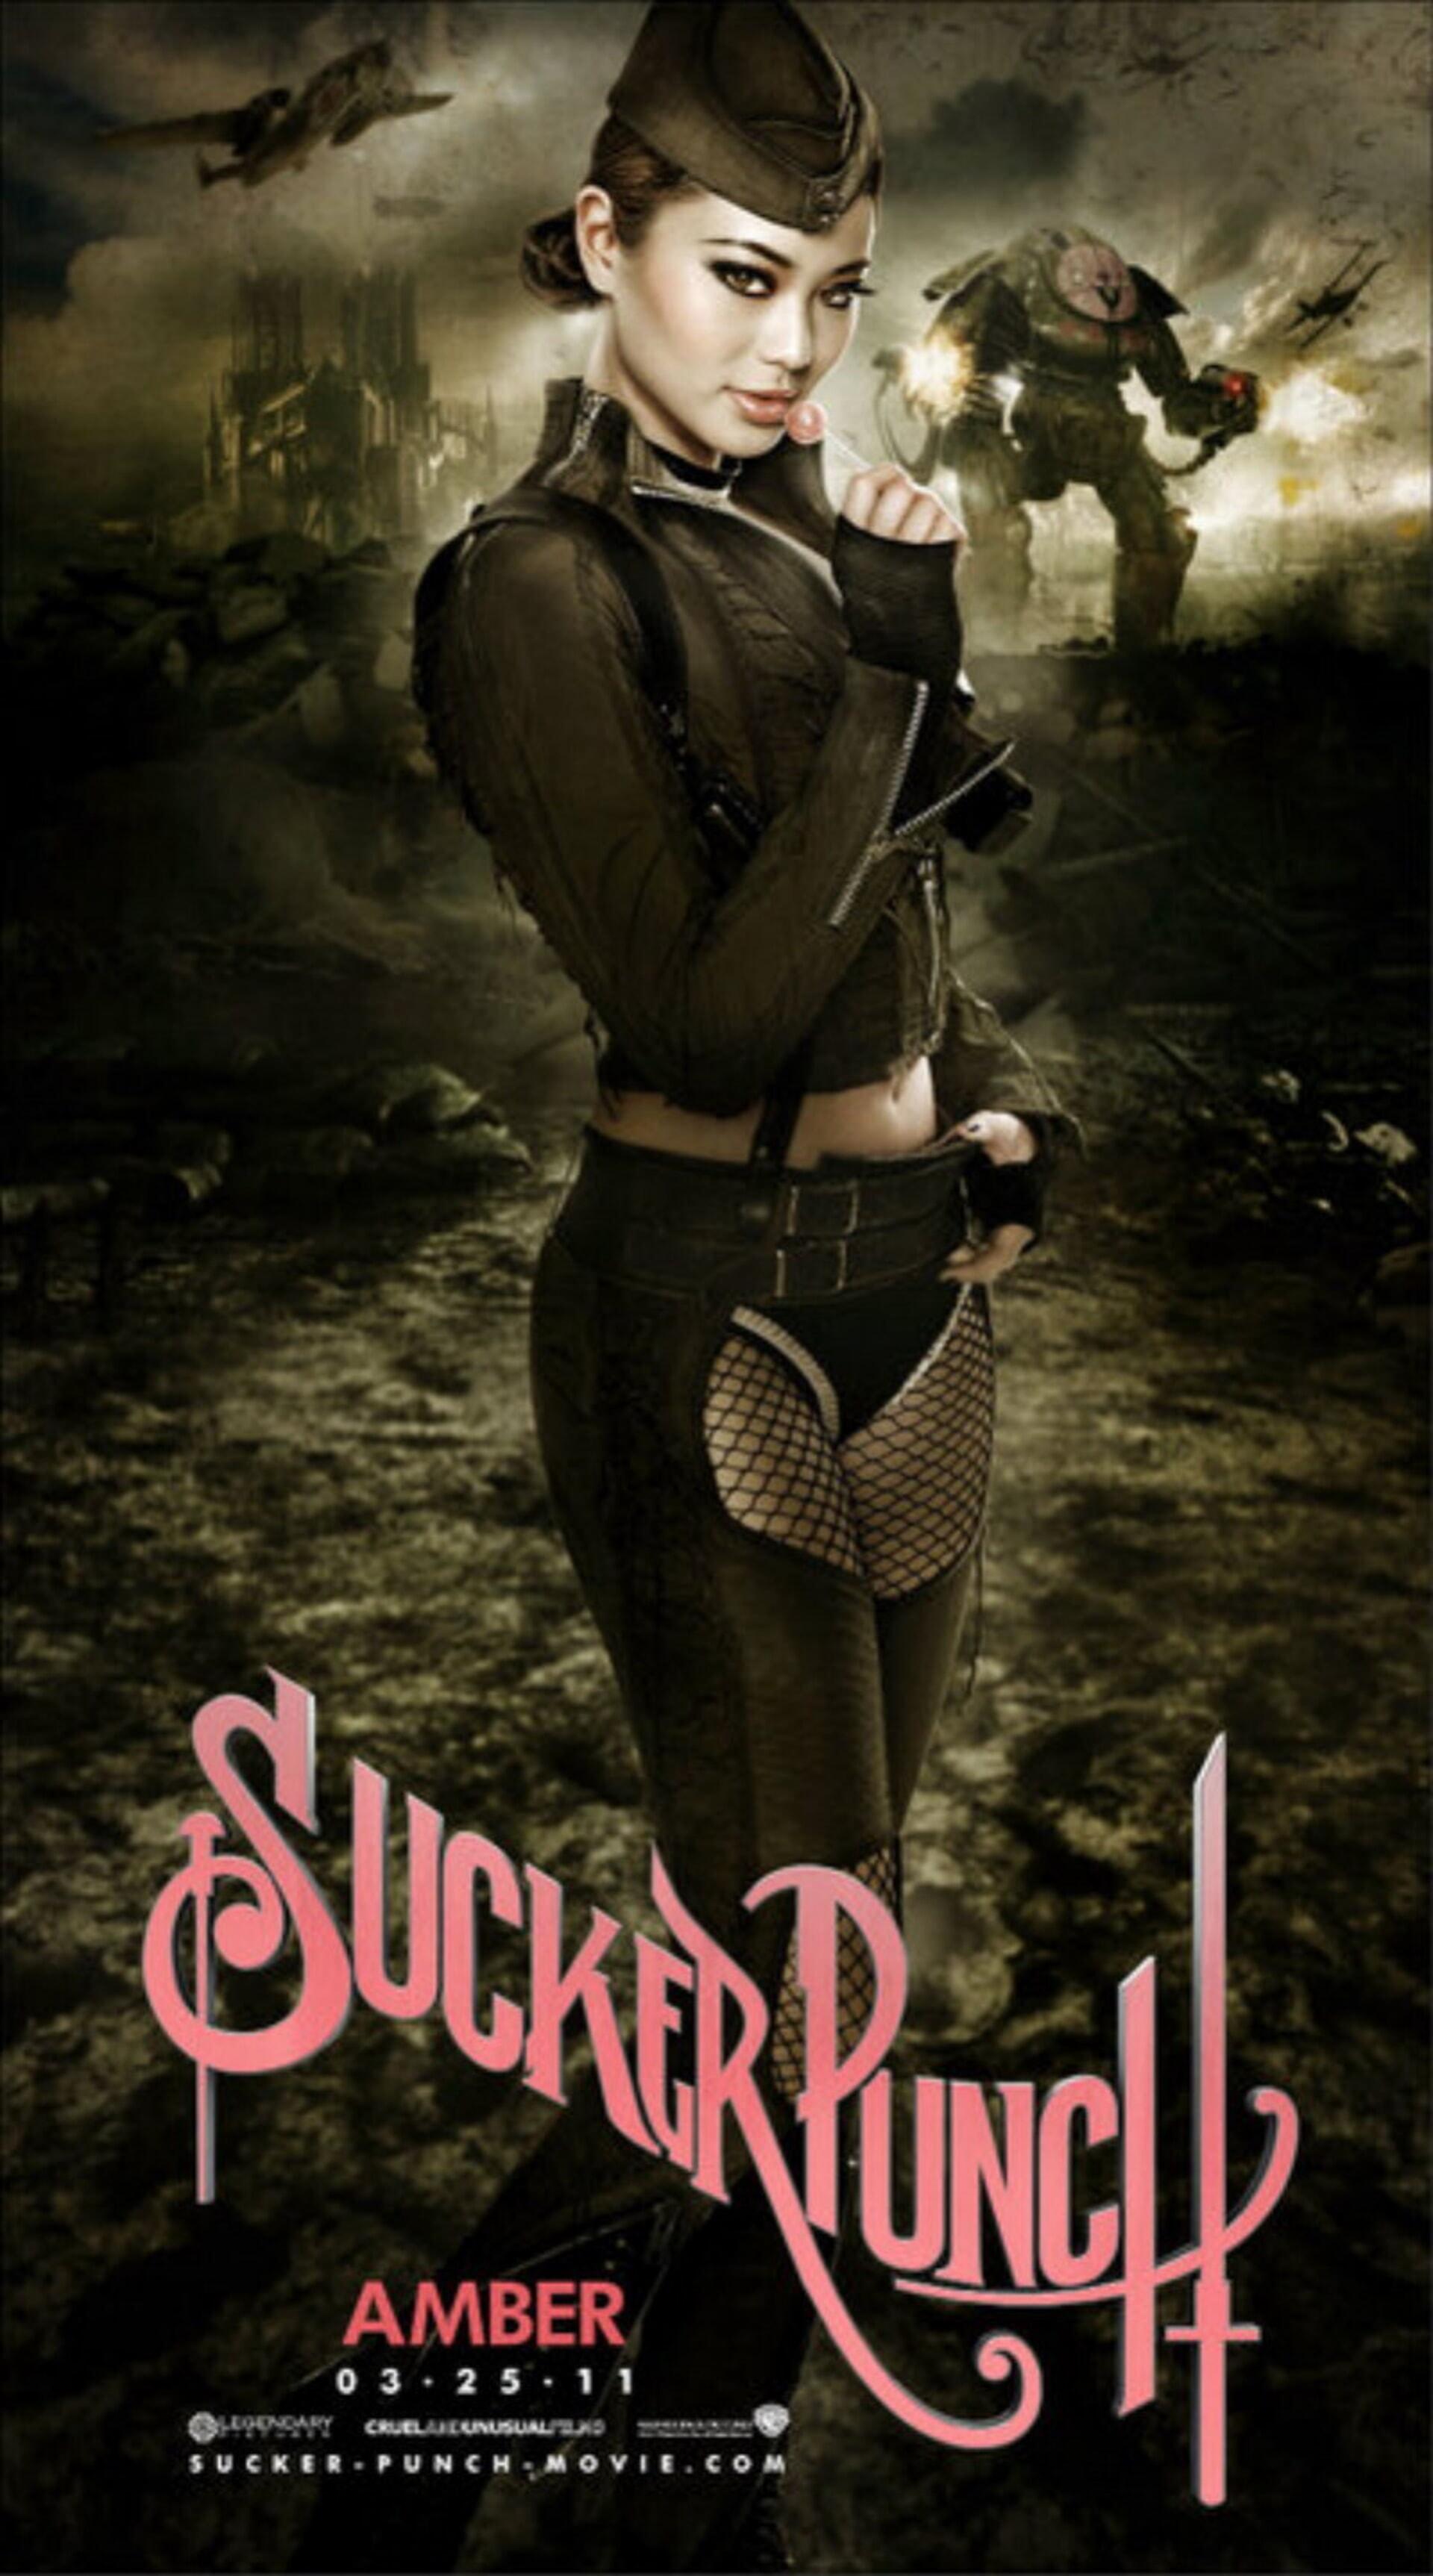 Sucker Punch - Poster 3